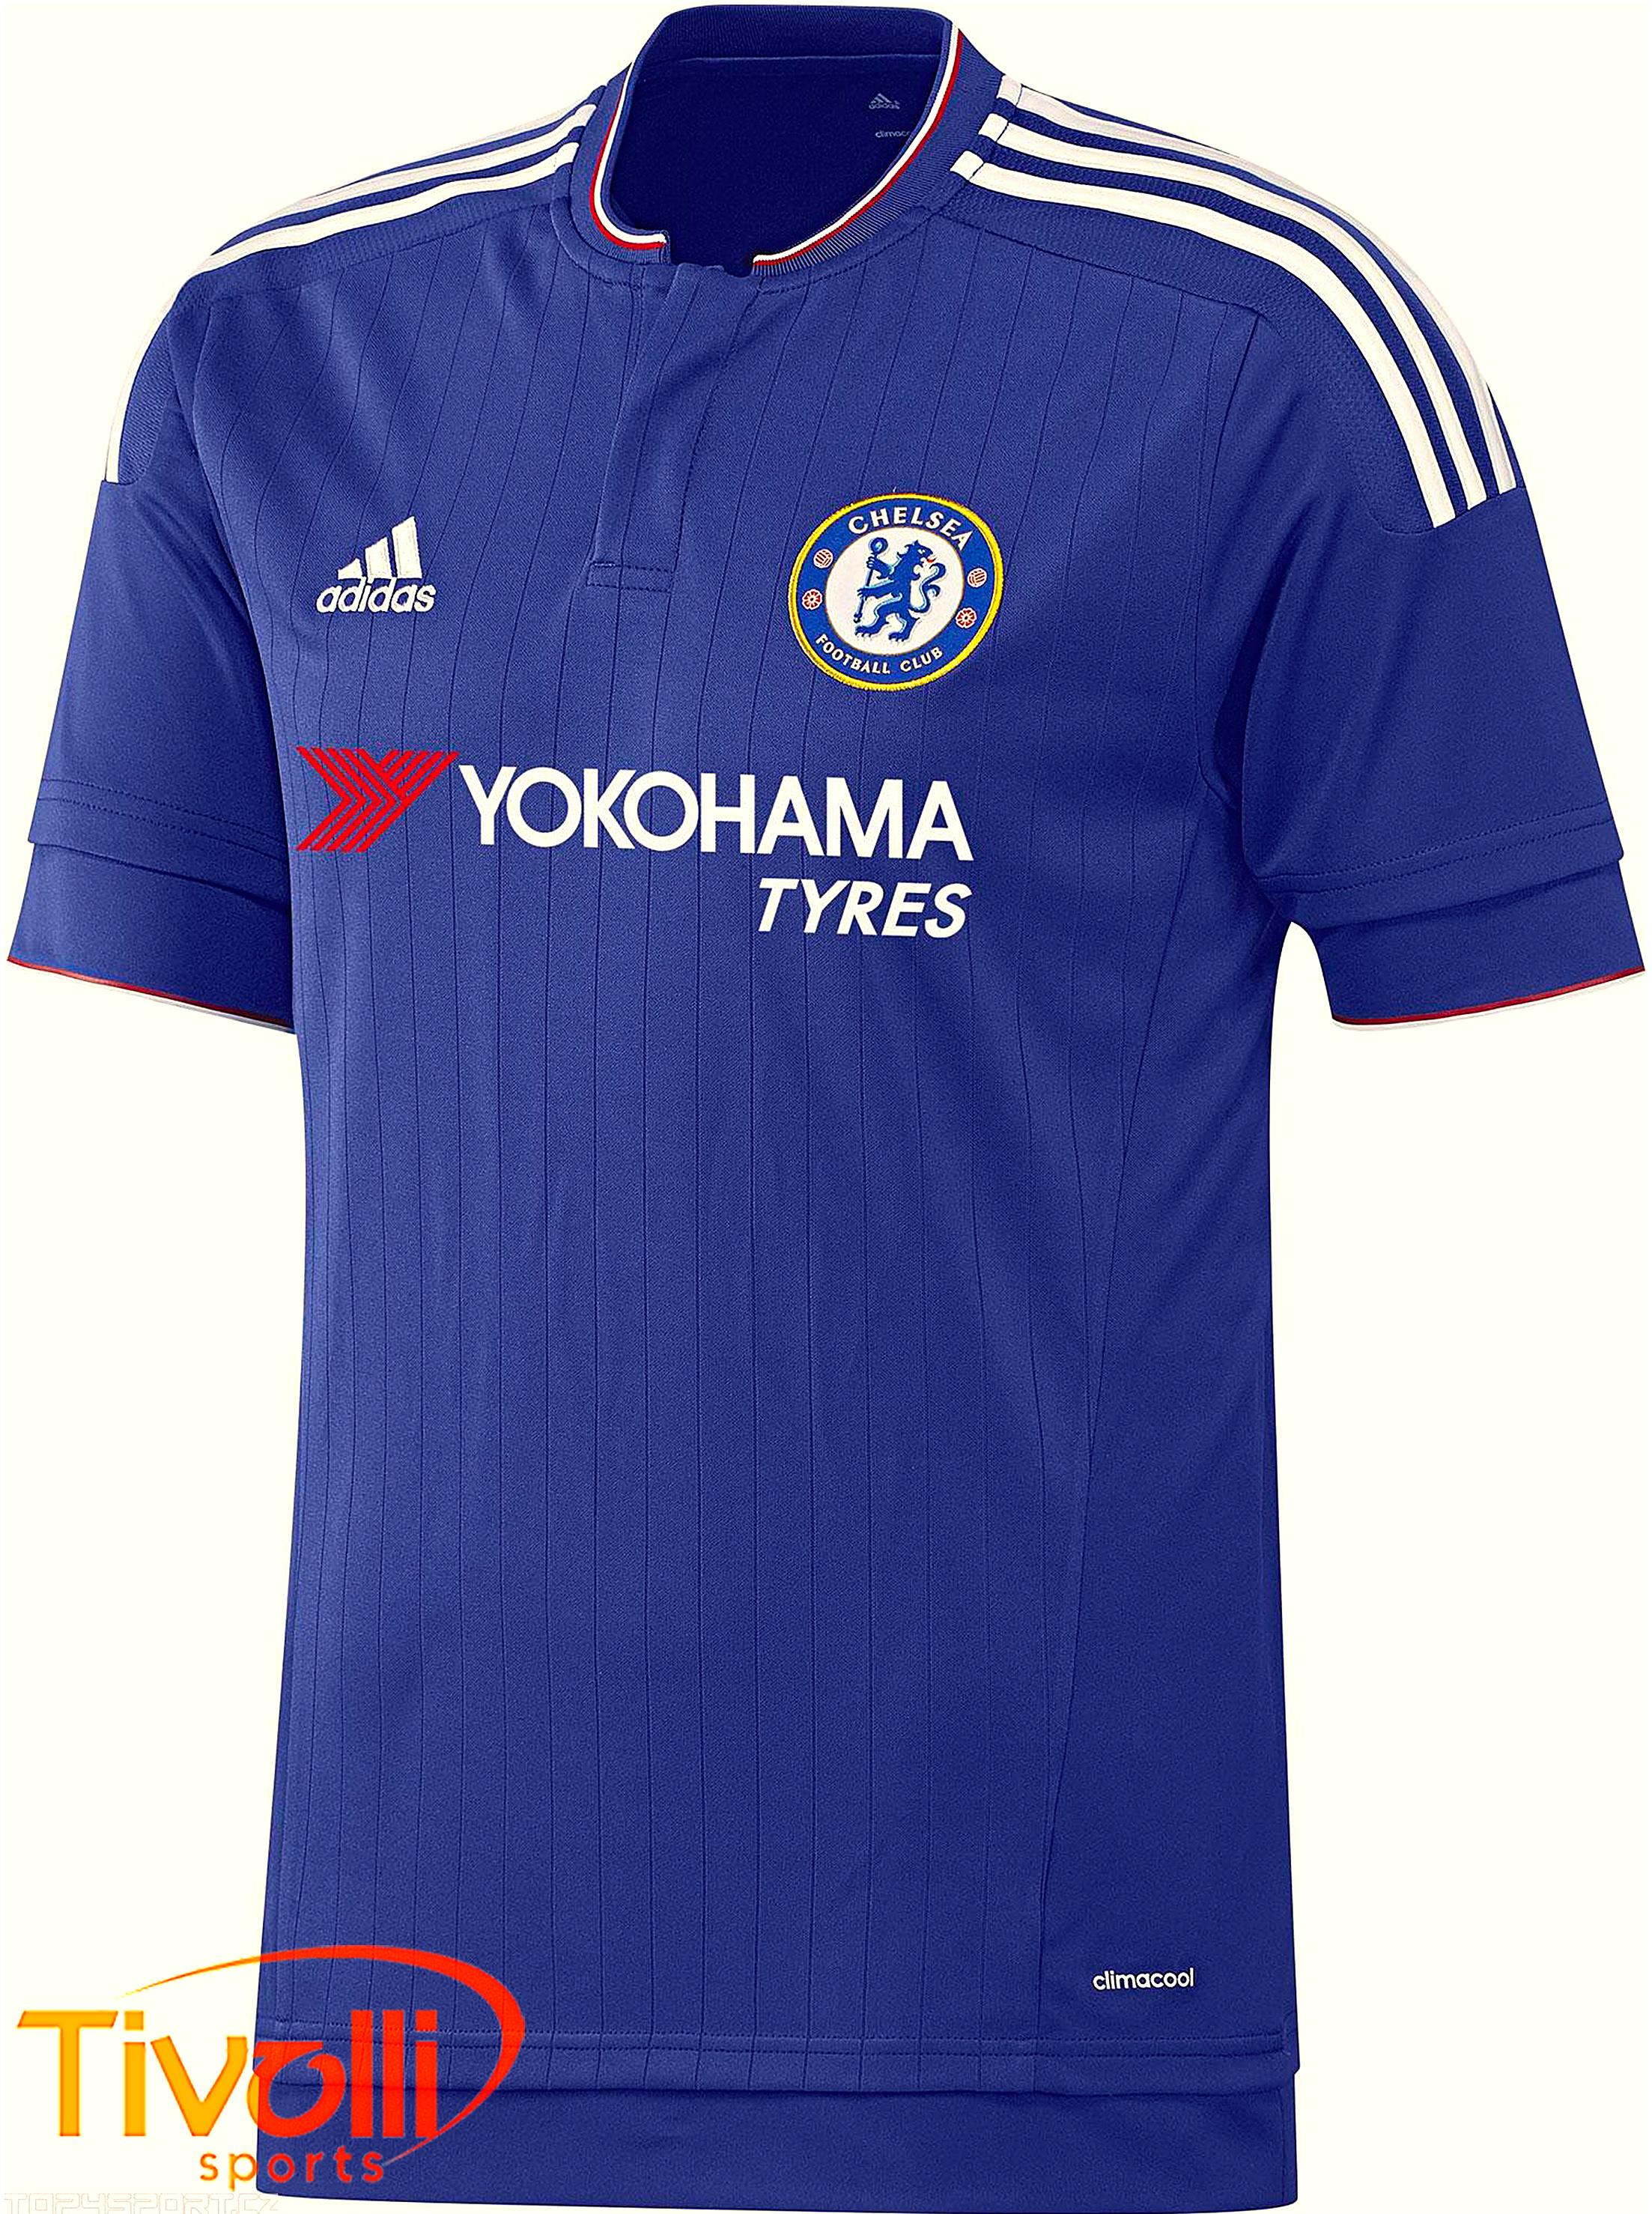 Camisa Chelsea I Adidas   - Mega Saldão   a8cba33d17d6e